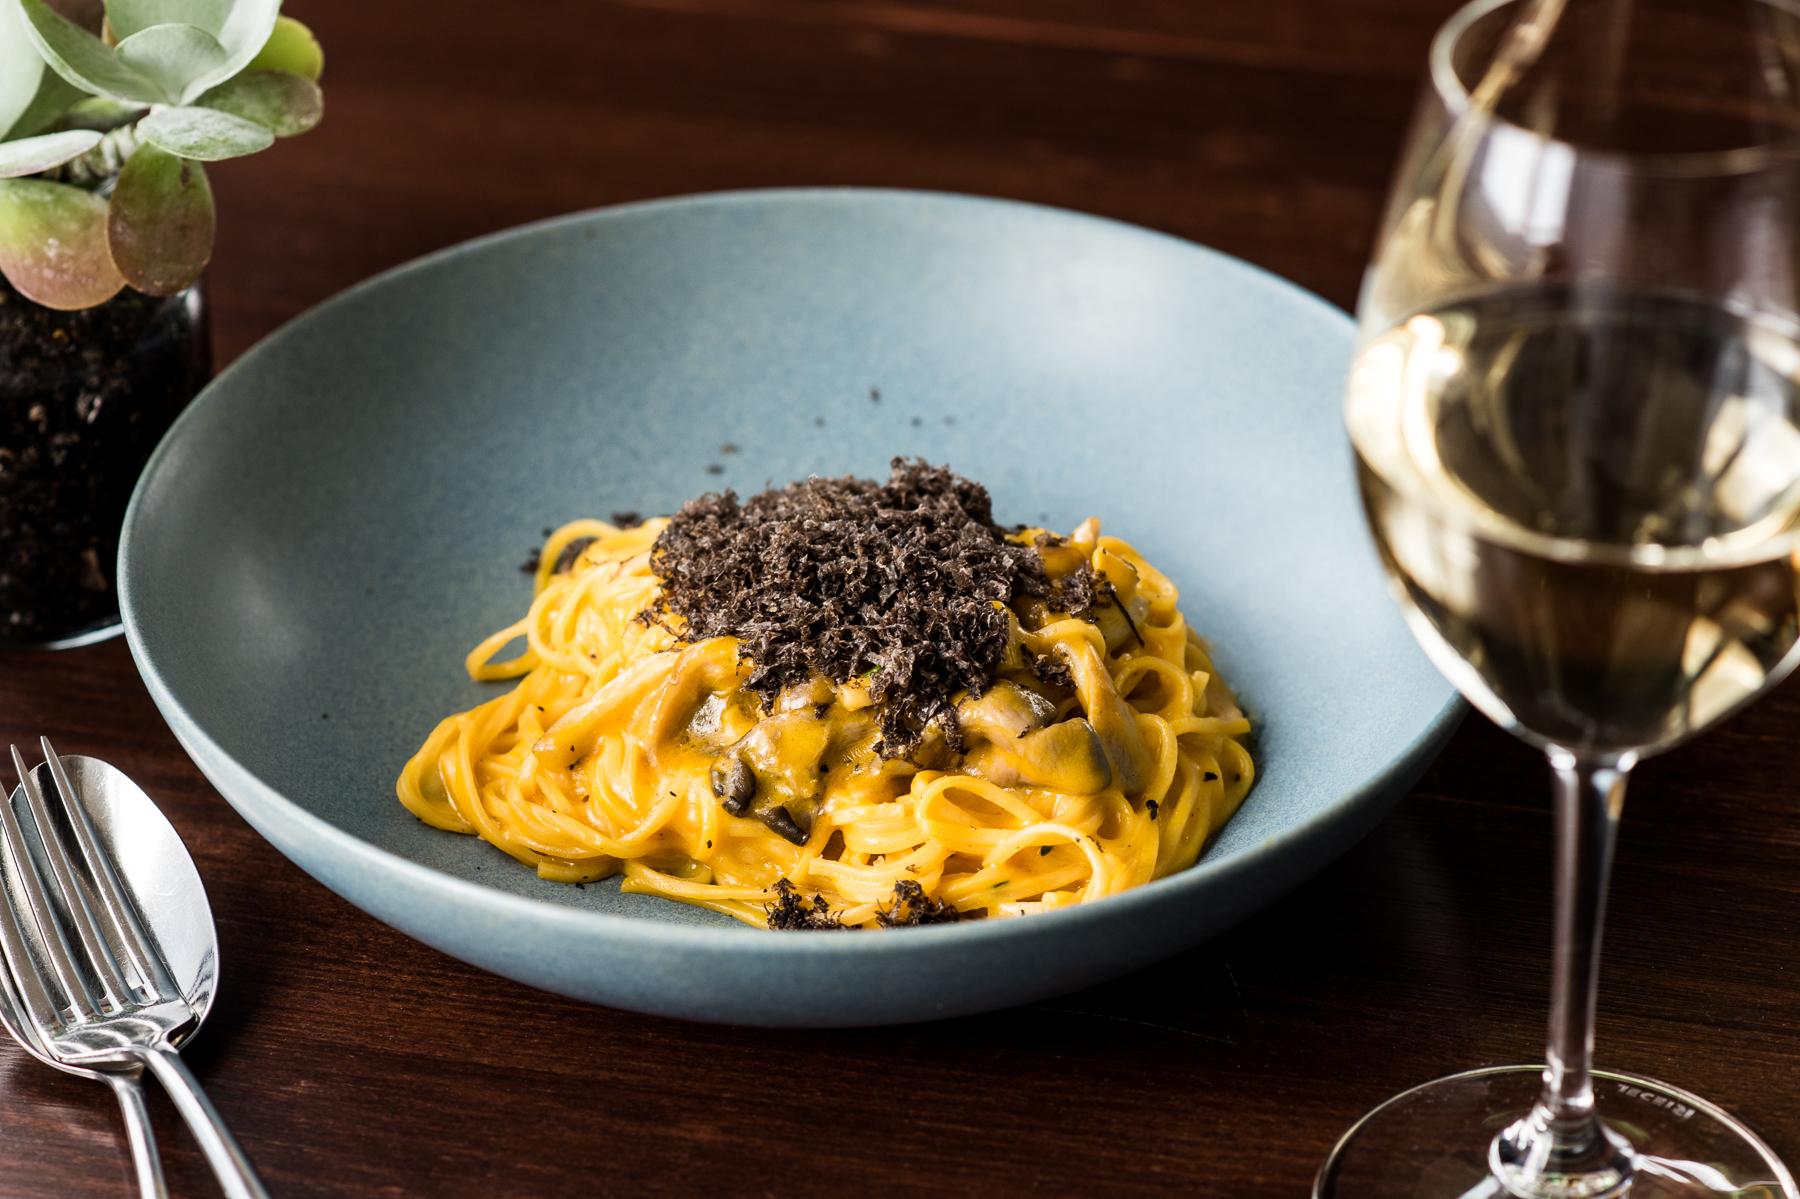 The Nielsen pasta wine